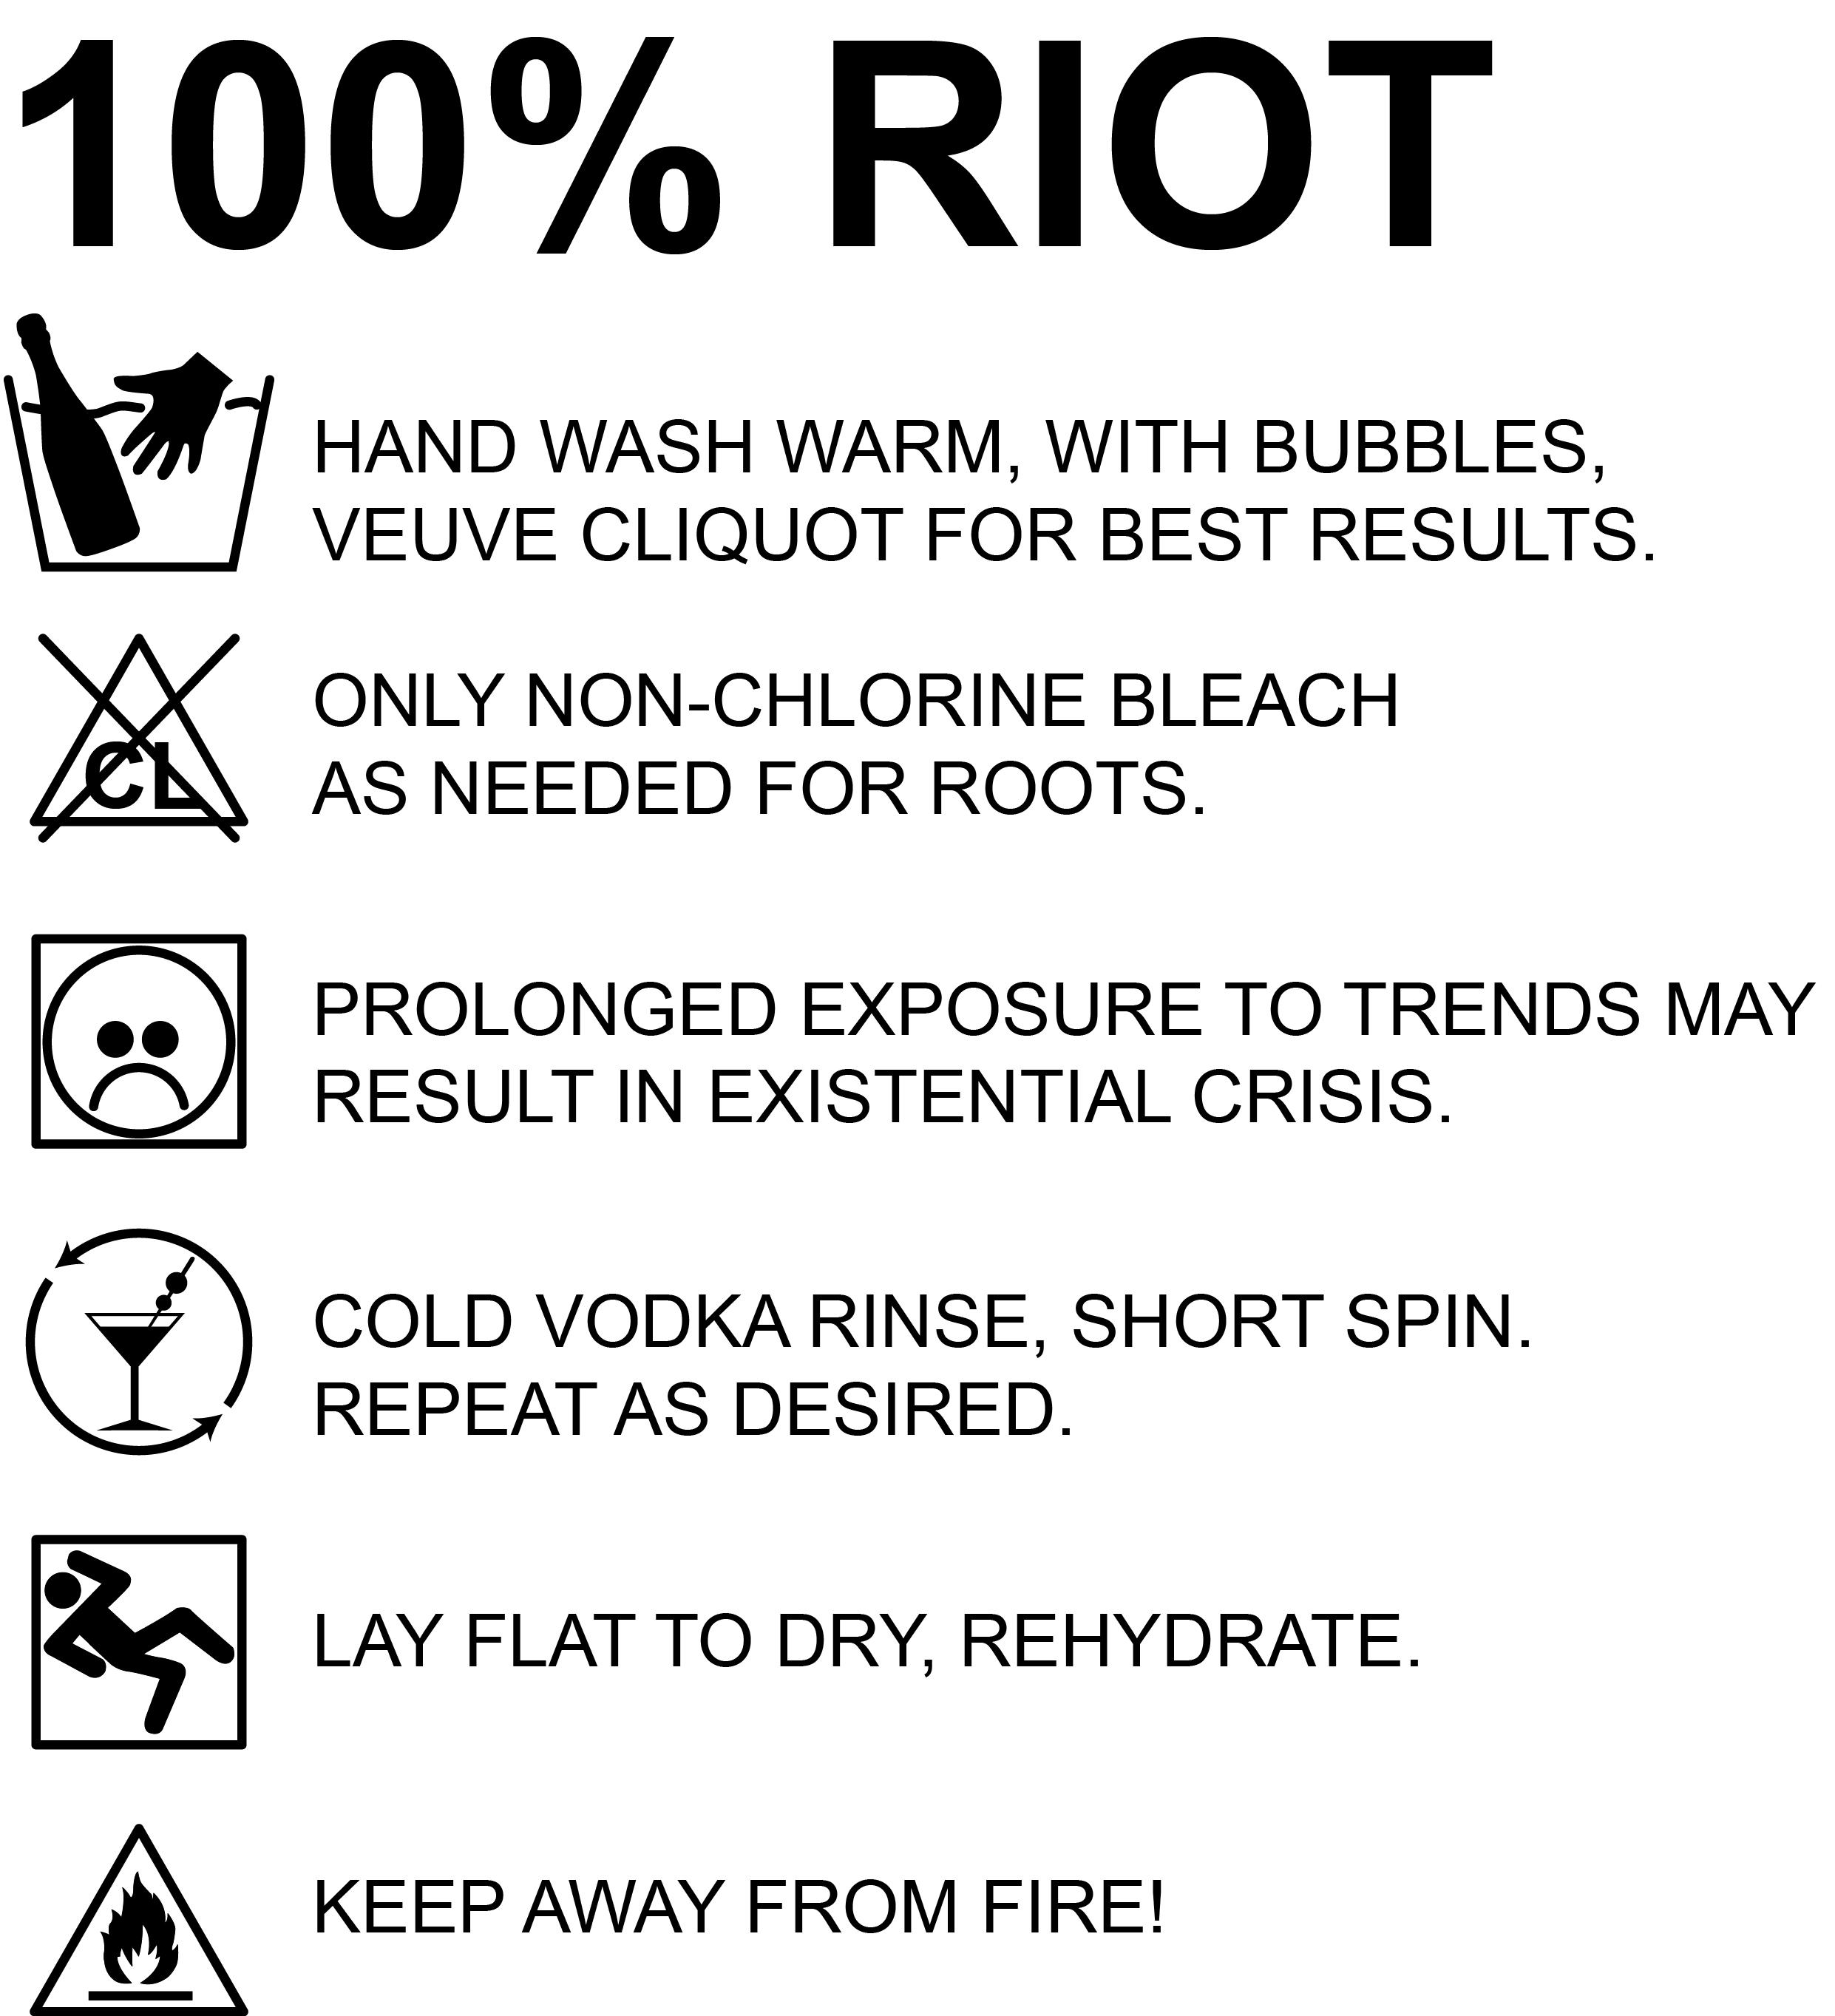 riot care label.jpg